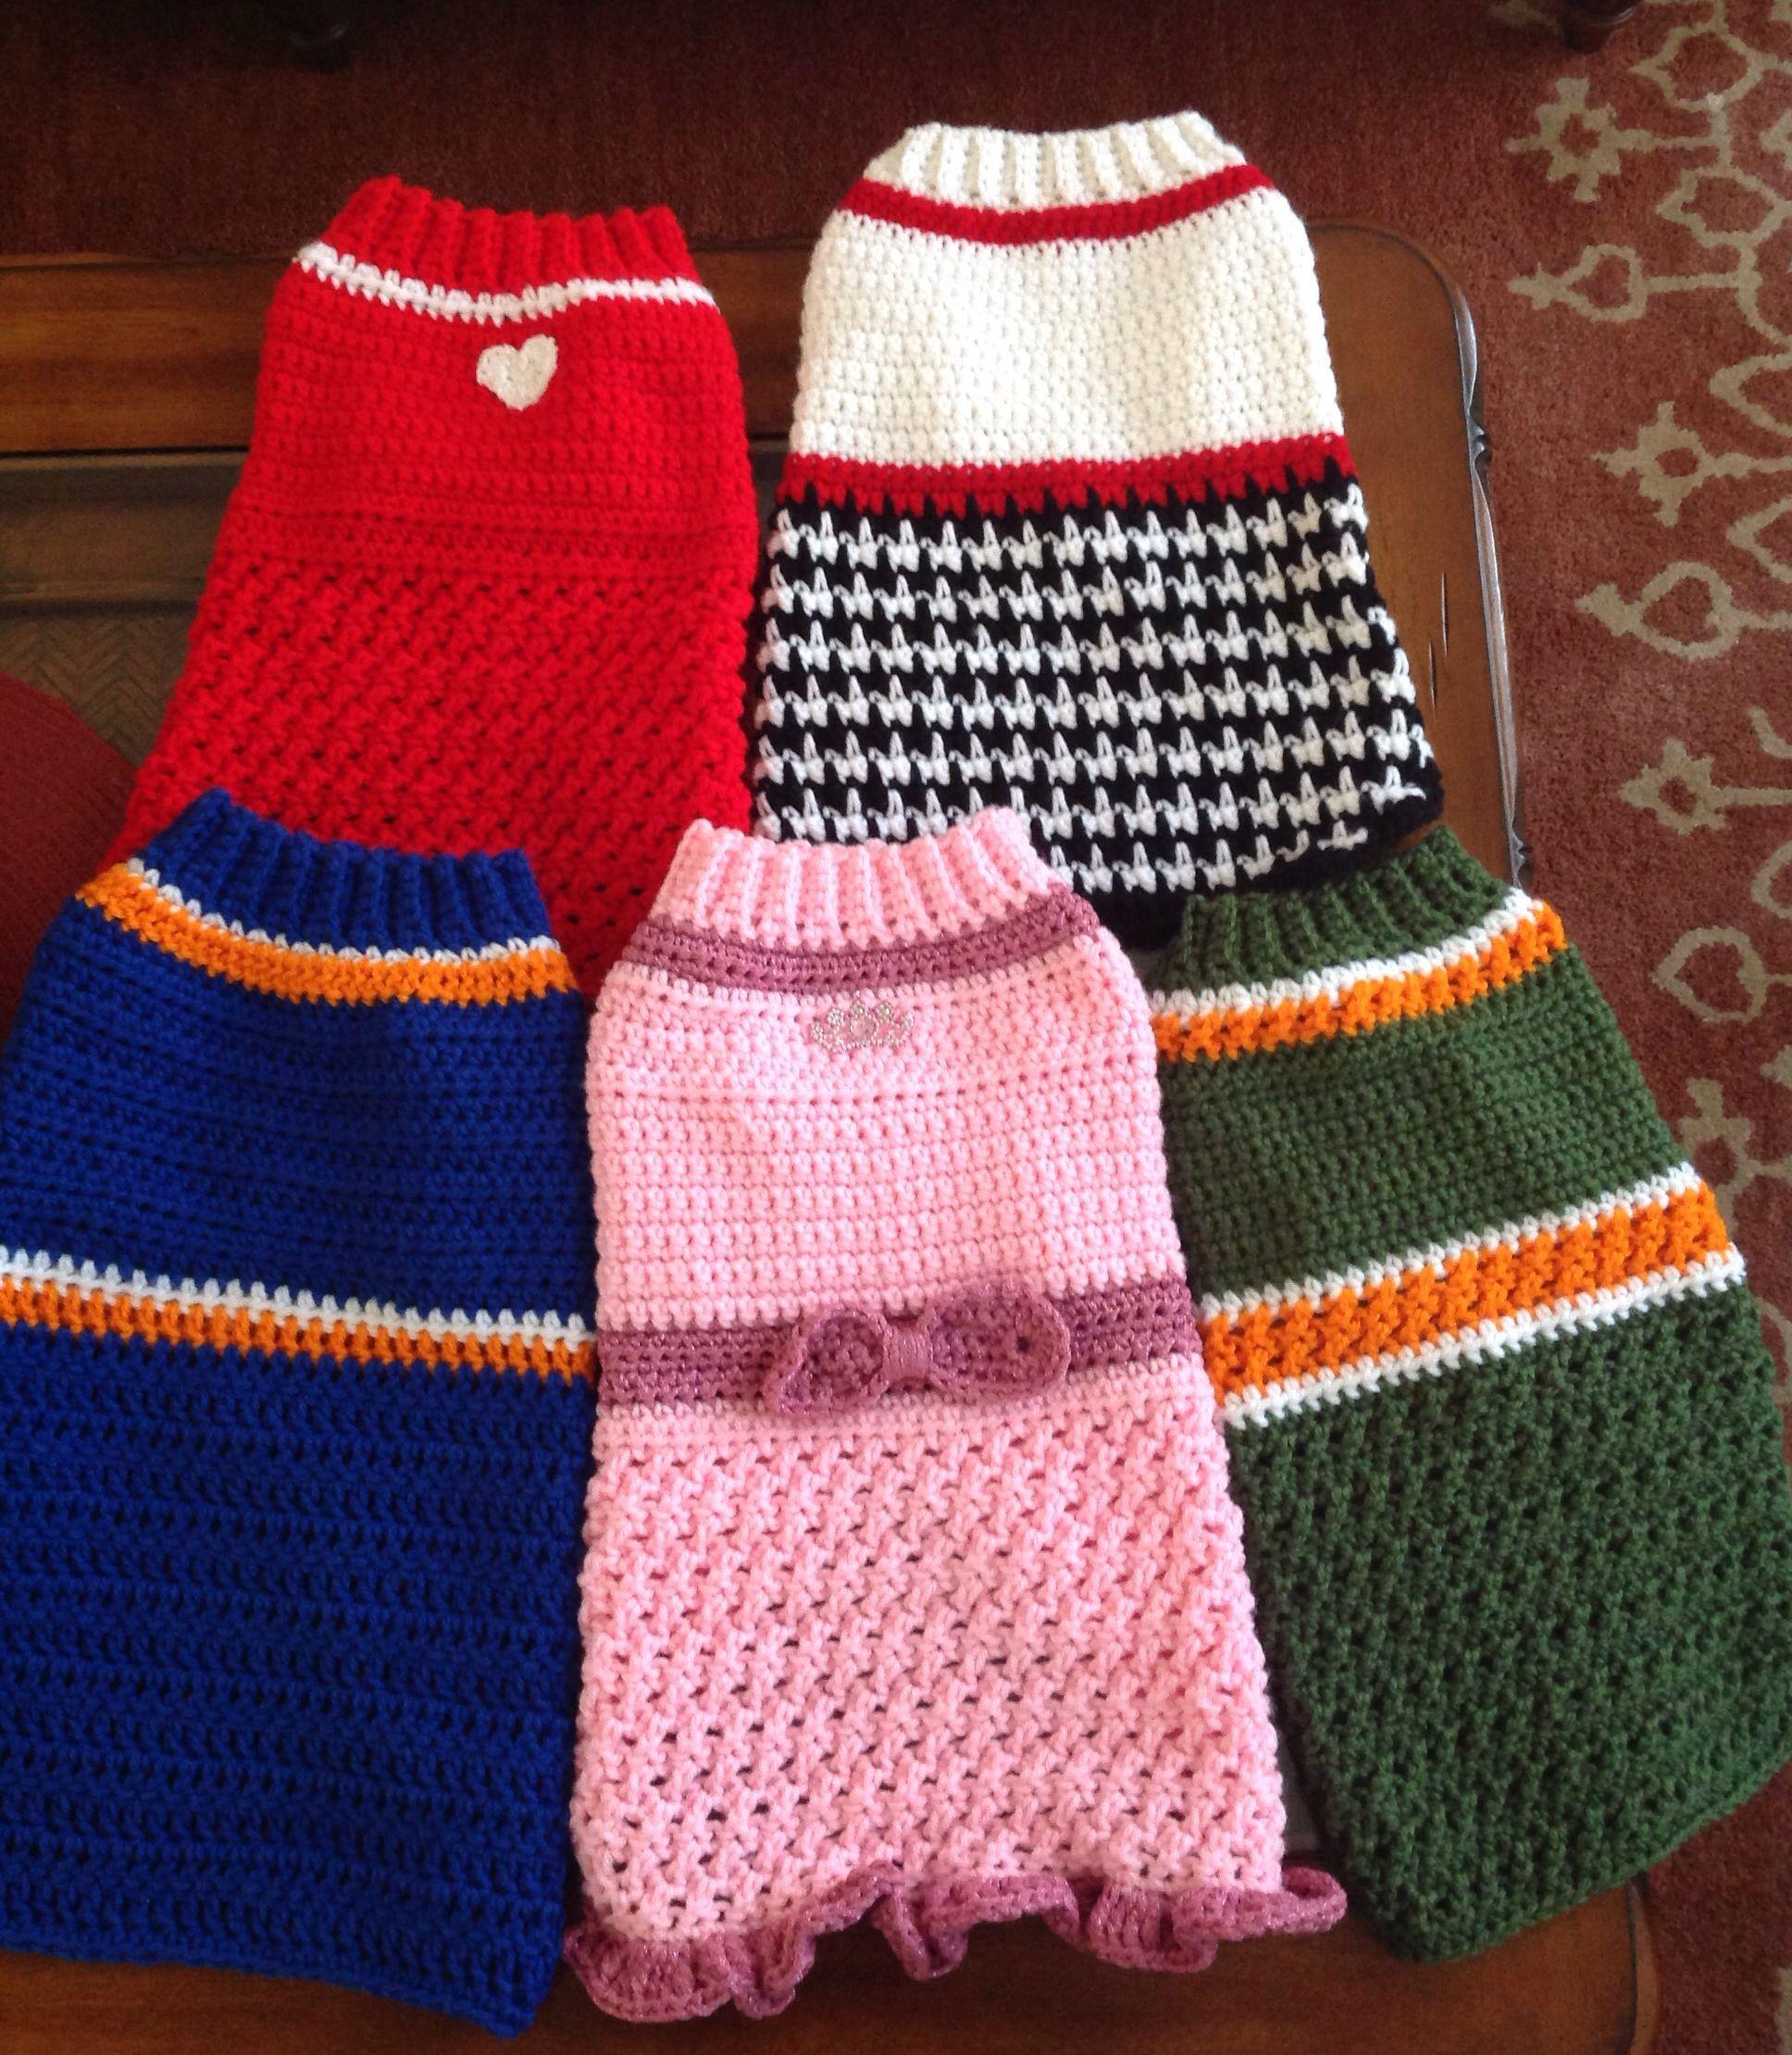 Crochet dog sweaters Crochet My favorite things